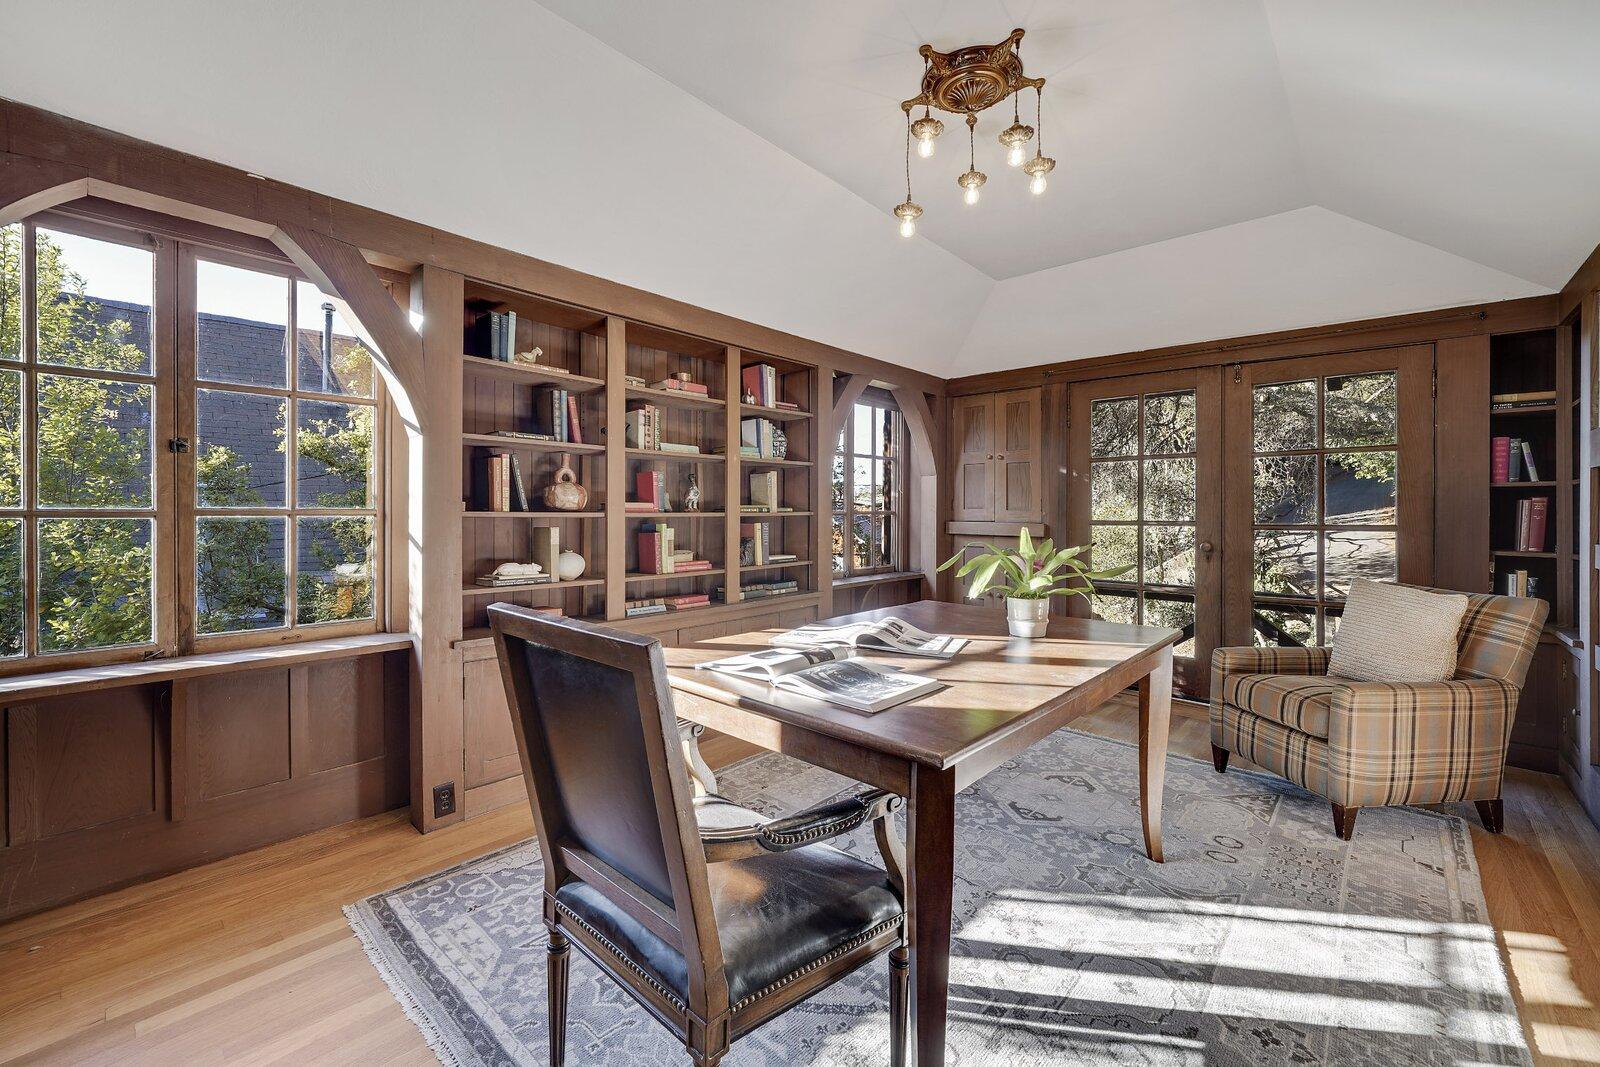 Ericsson-Bray House library